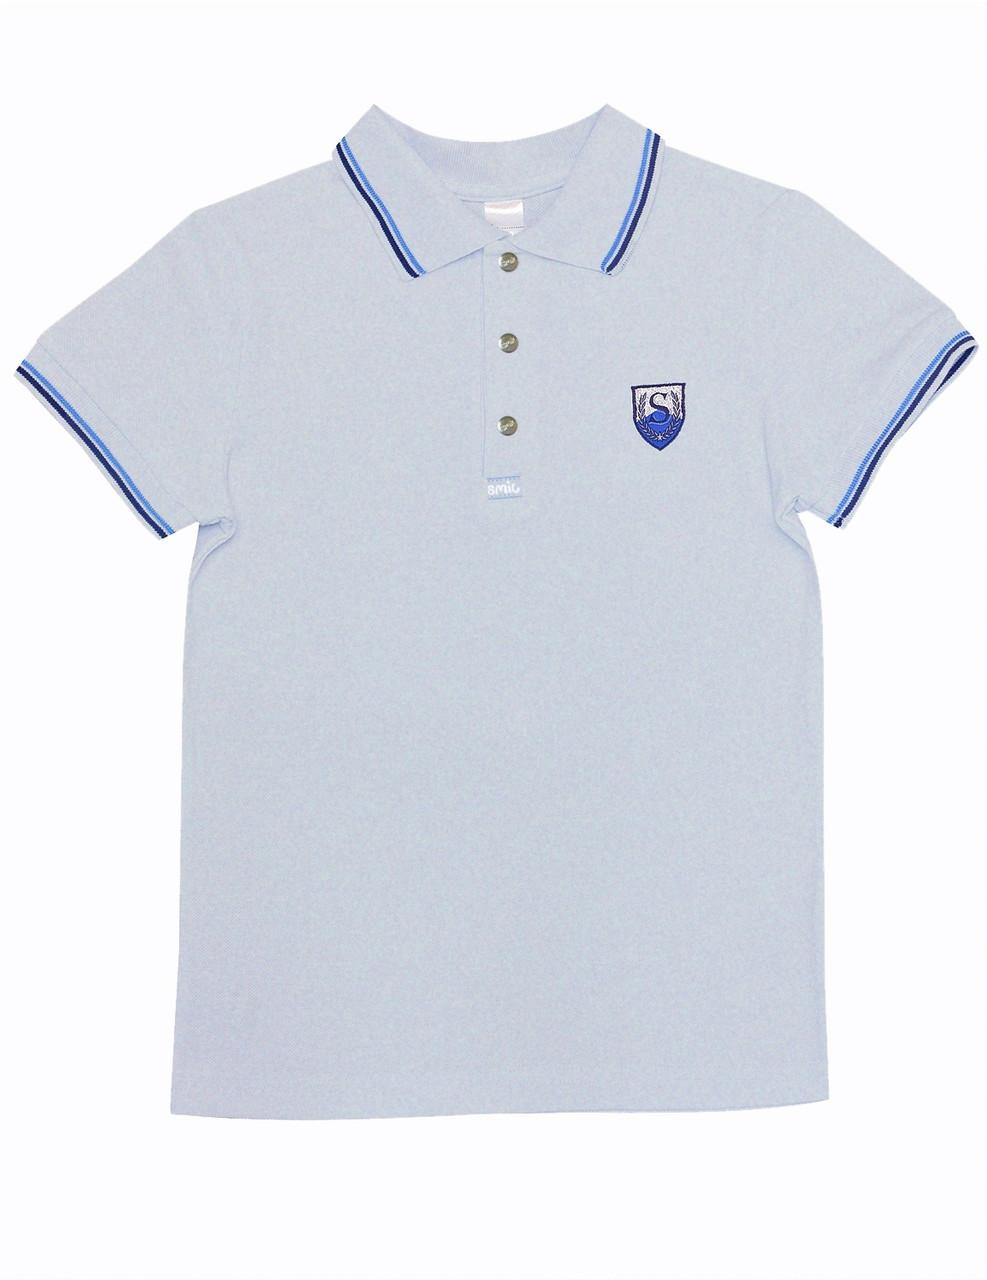 Рубашка поло для мальчика с коротким рукавом, серый меланж, SMIL (Смил), Украина 128,134